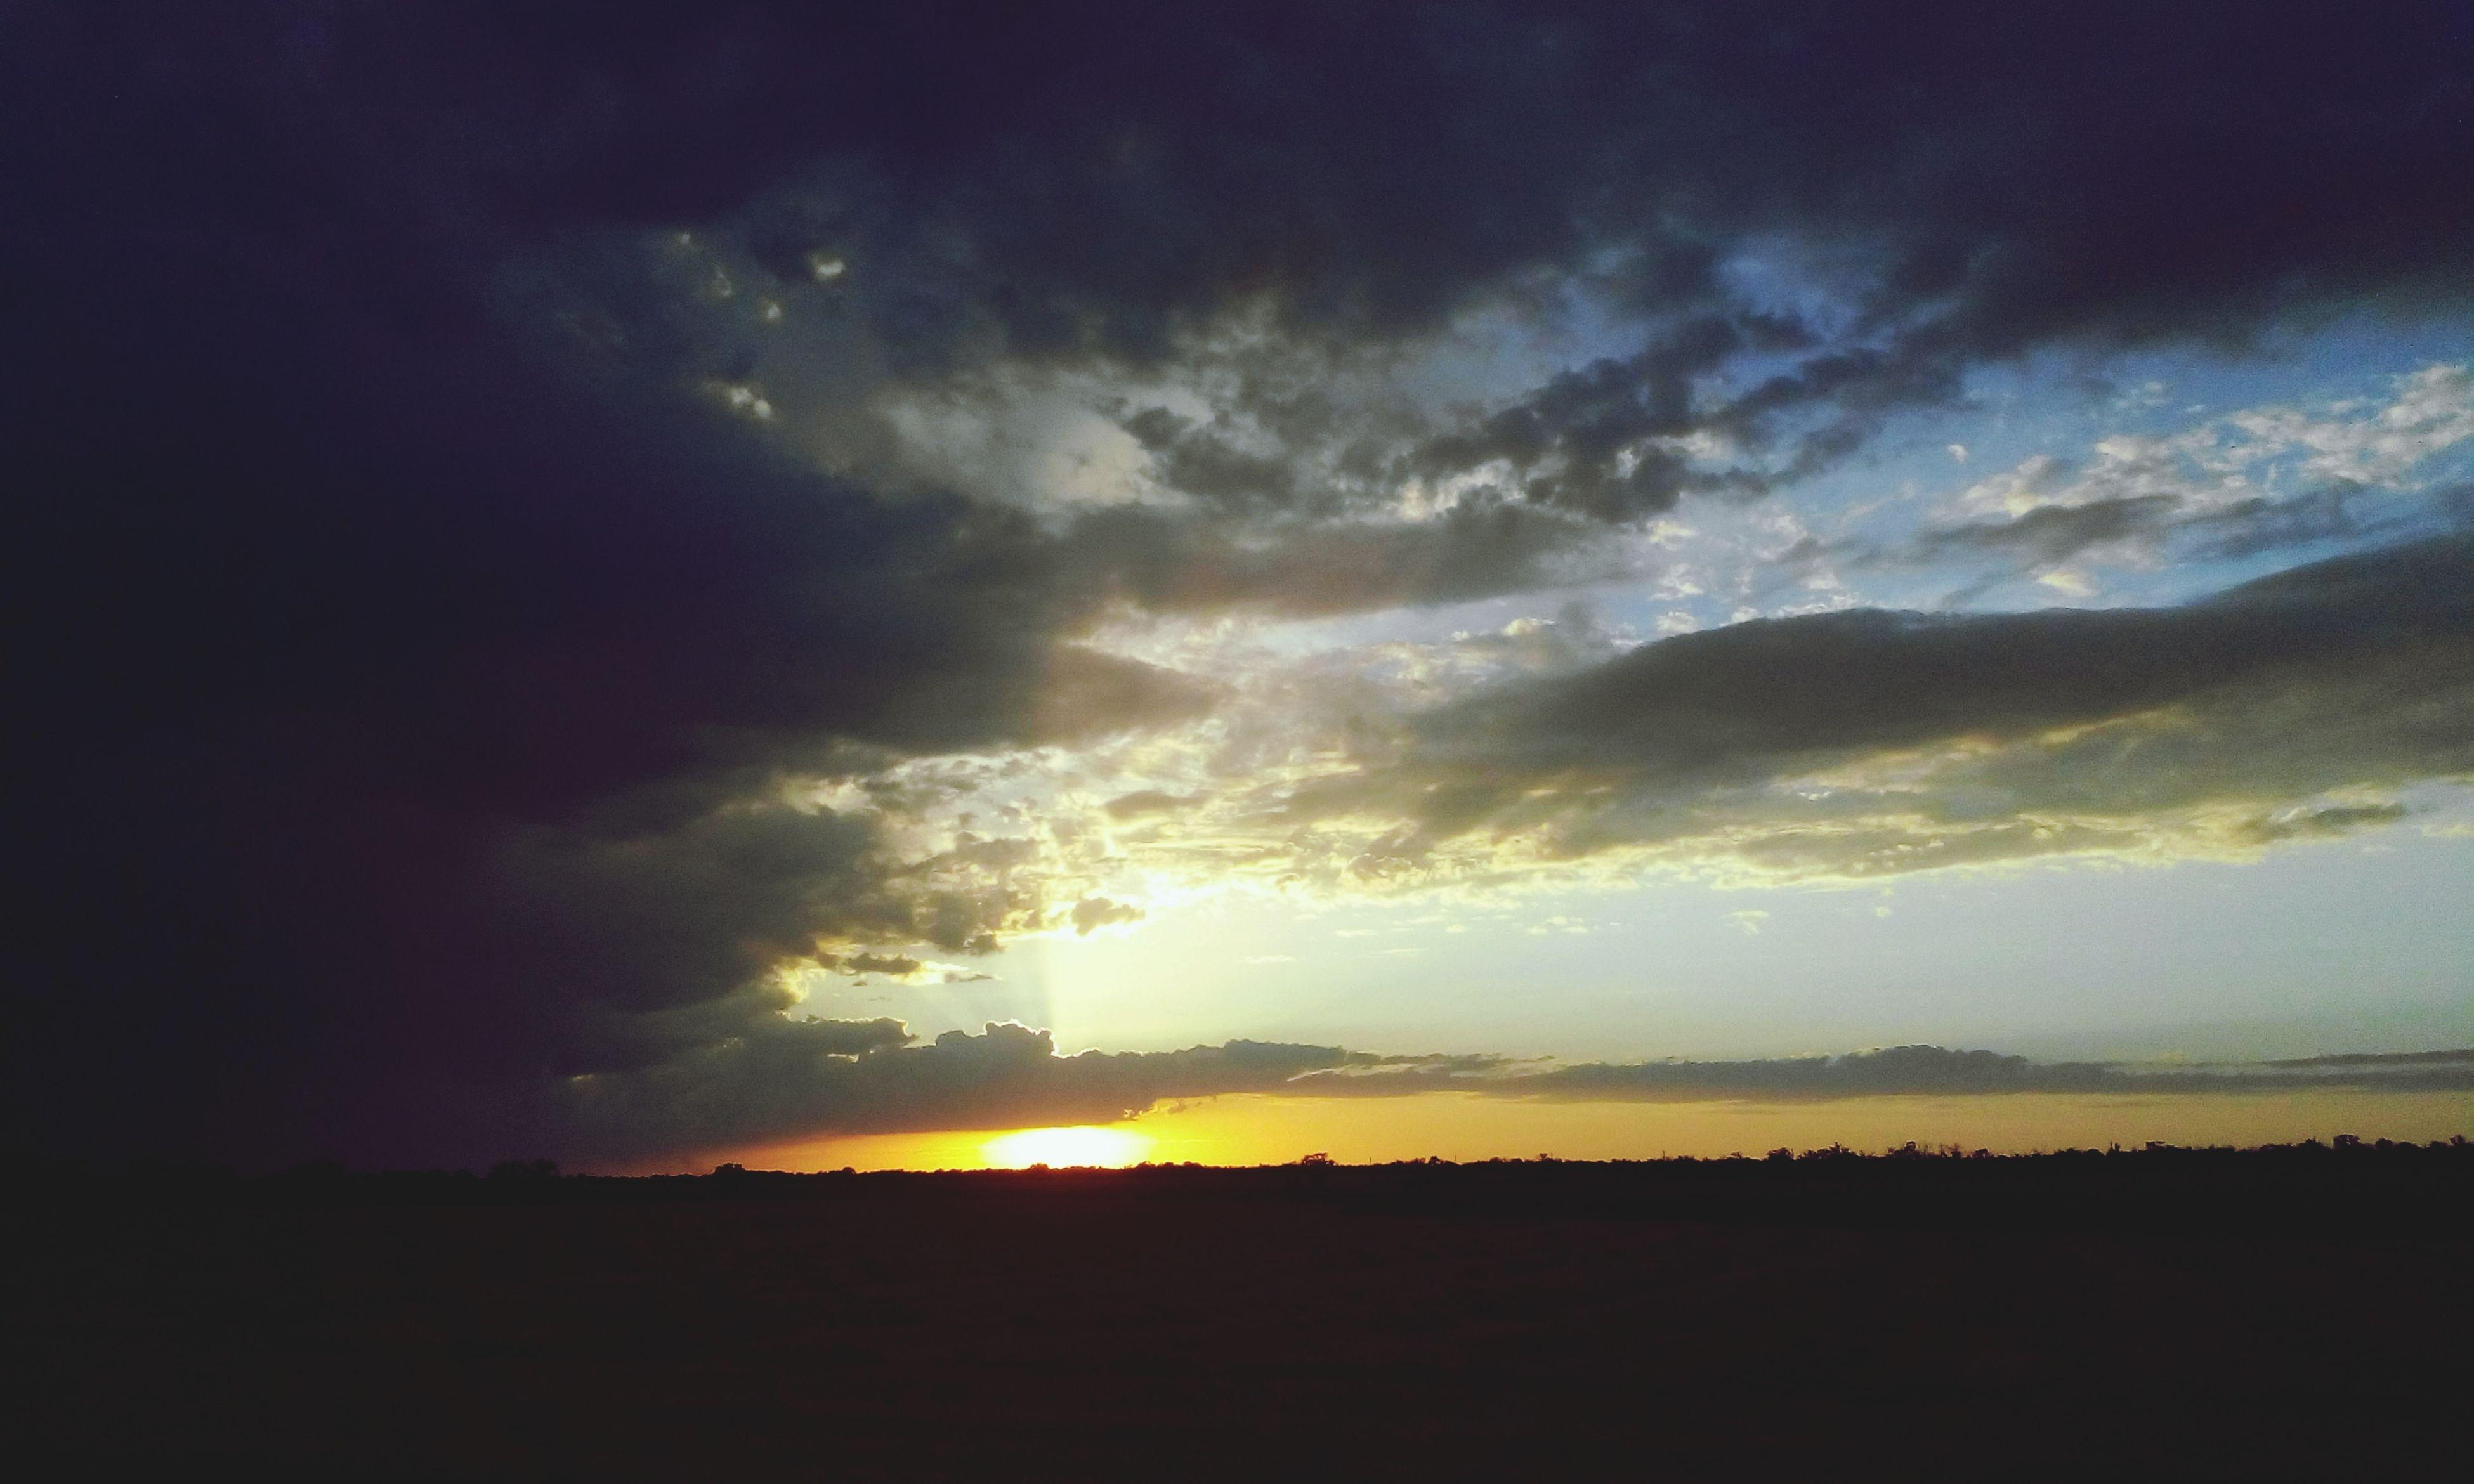 sunset, sky, tranquil scene, scenics, beauty in nature, tranquility, landscape, silhouette, cloud - sky, sun, nature, idyllic, field, cloud, sunlight, sunbeam, dramatic sky, cloudy, outdoors, orange color